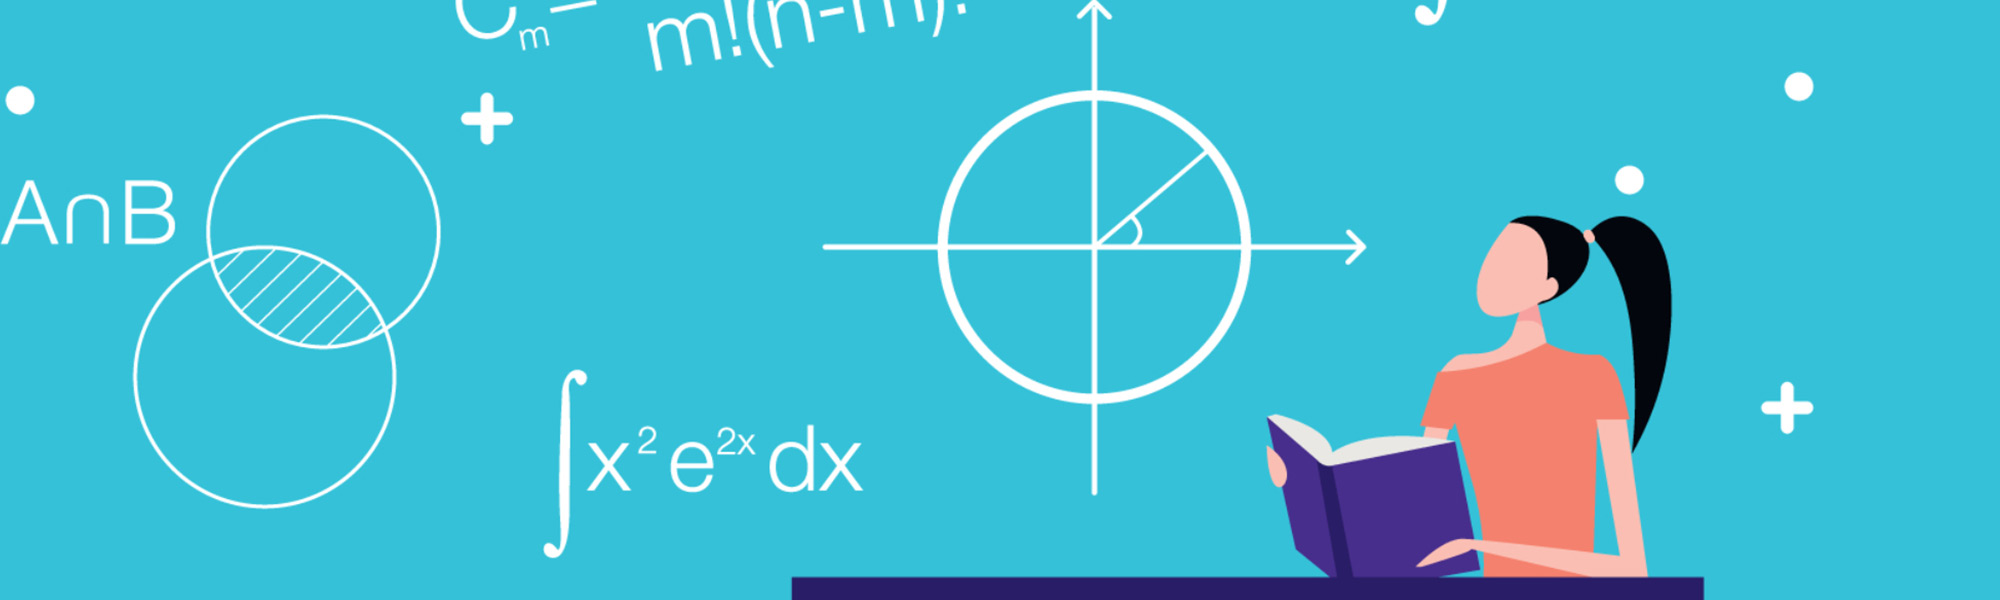 Mathematics concept